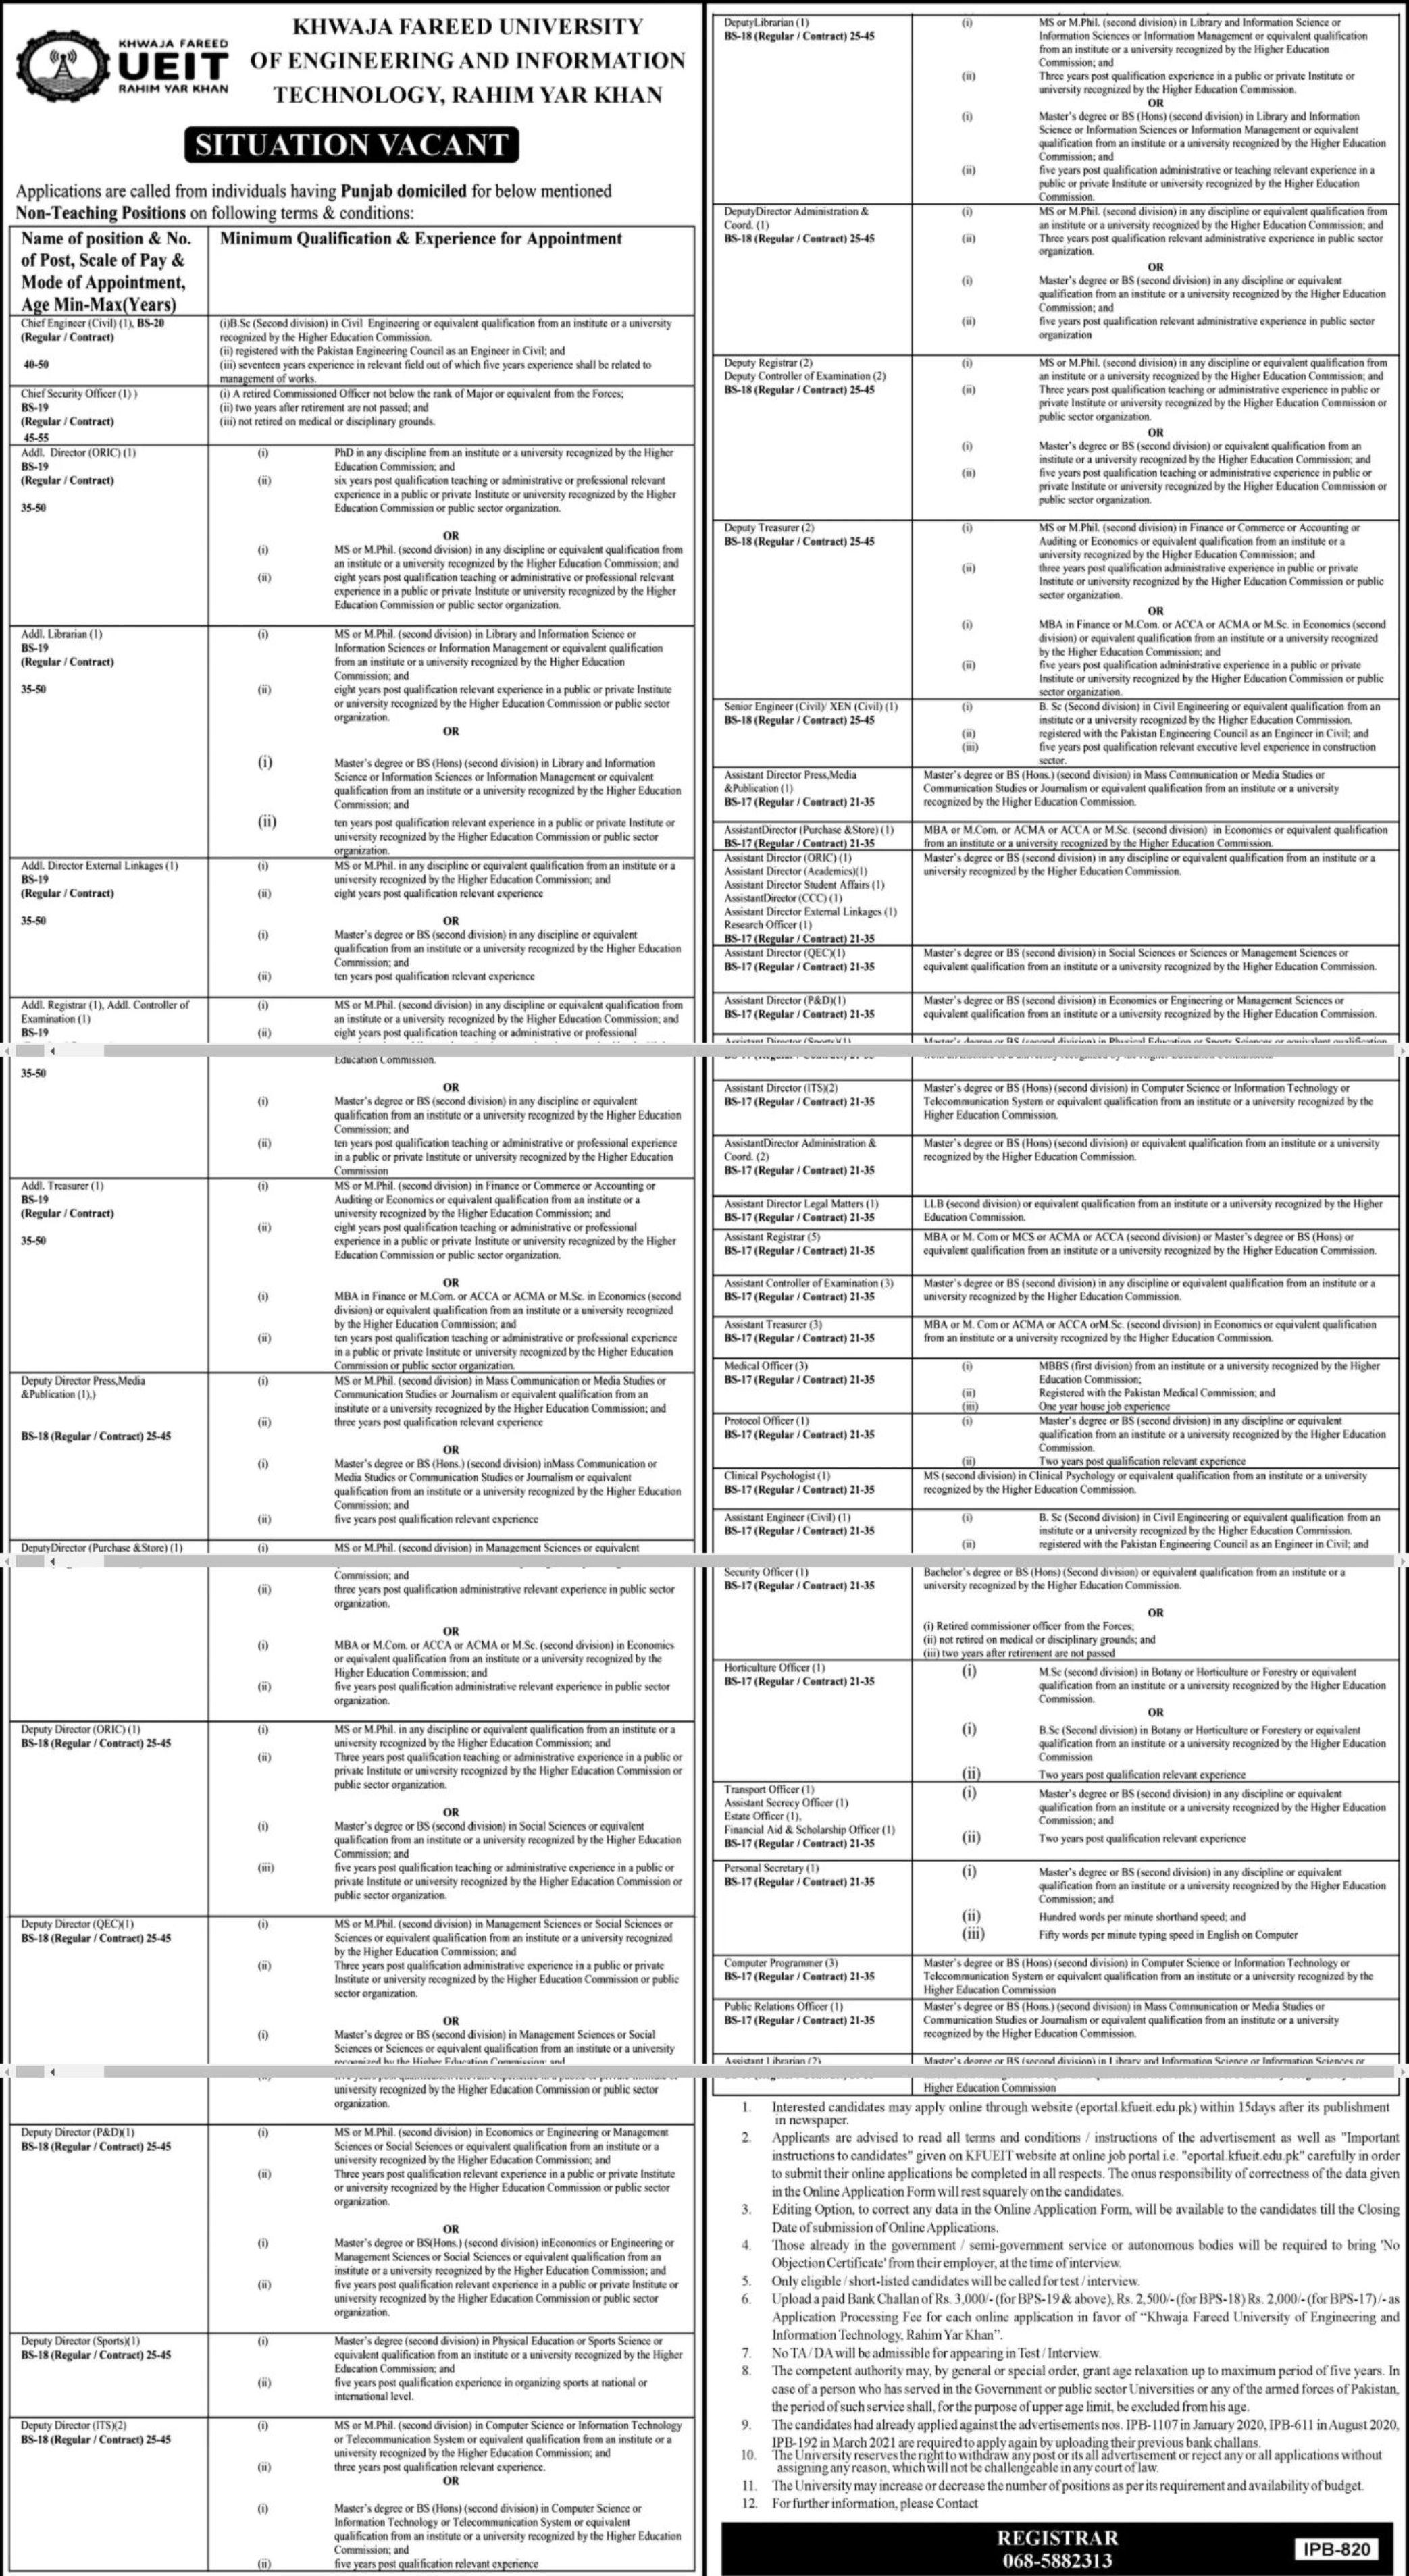 Khwaja Fareed University of Engineering and Information Technology Vacancies 2021 3